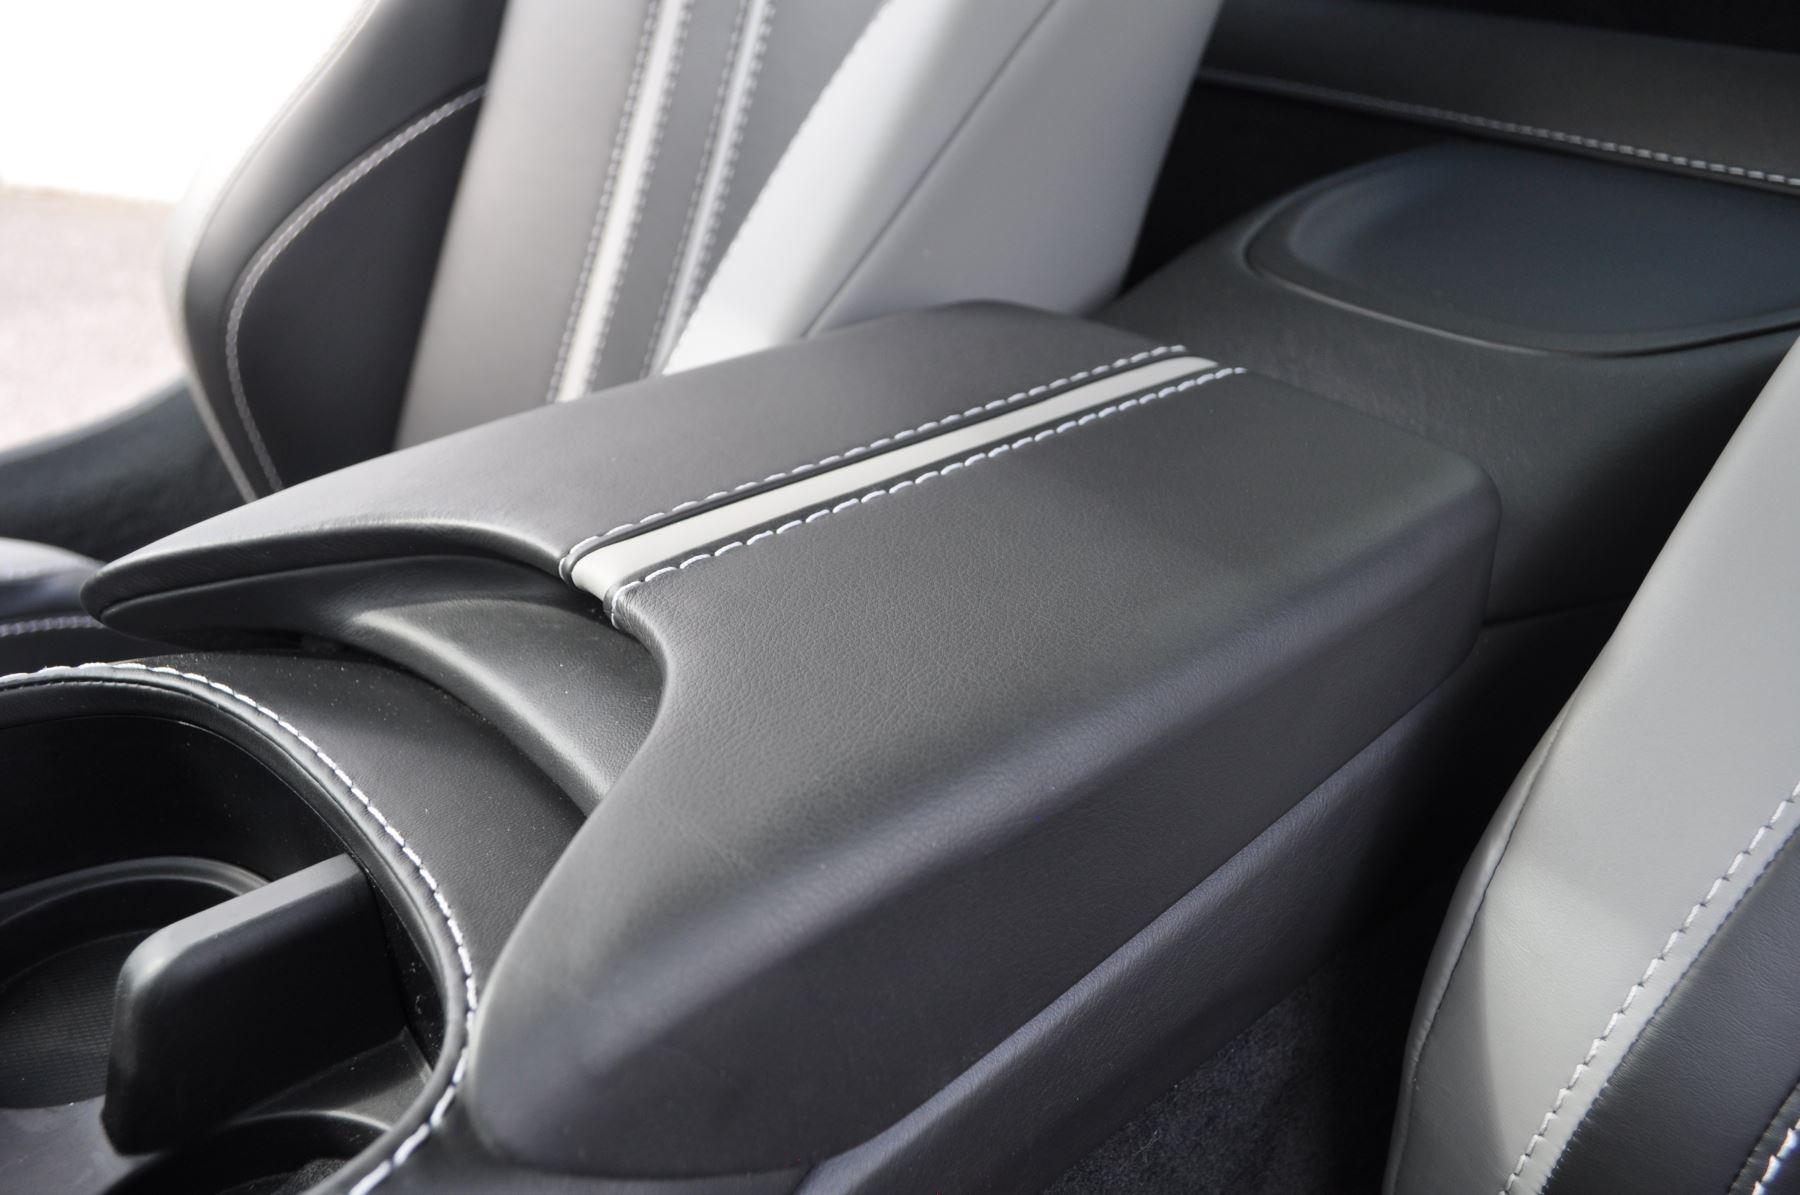 Aston Martin New Vantage 2dr ZF 8 Speed image 26